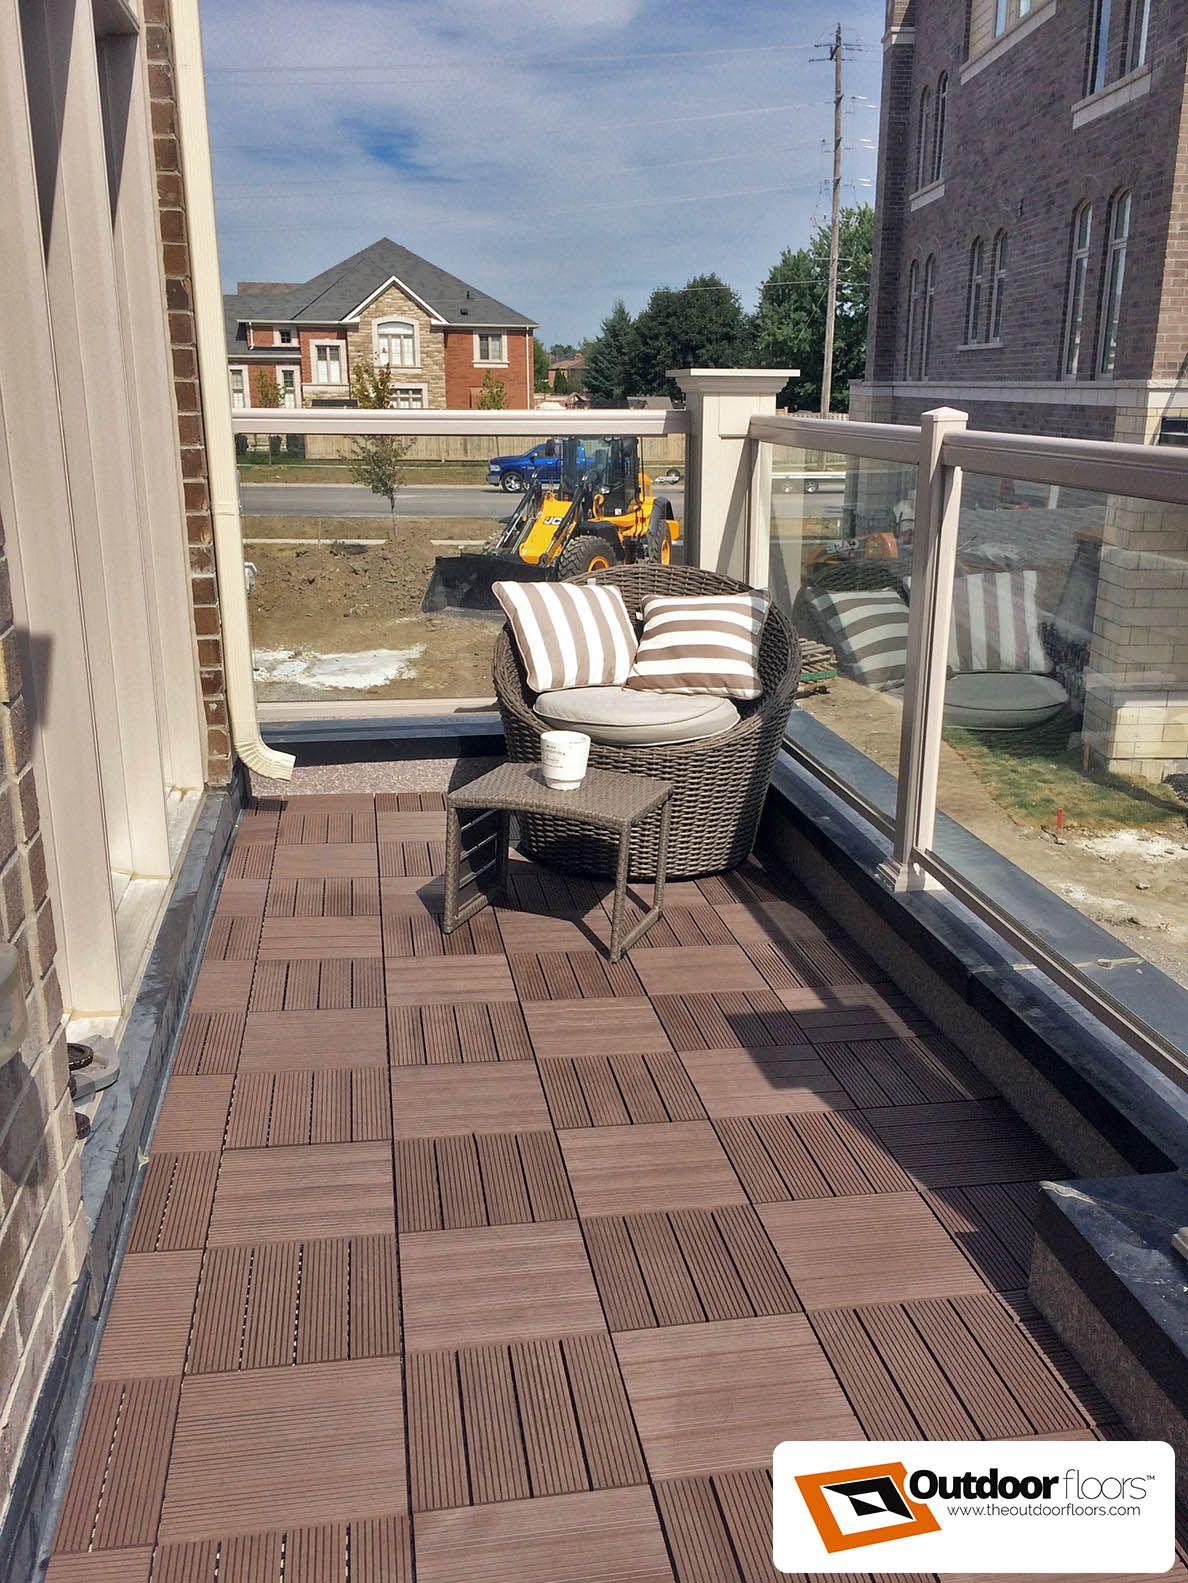 Parquet checker board style balconyterrace decking Brown